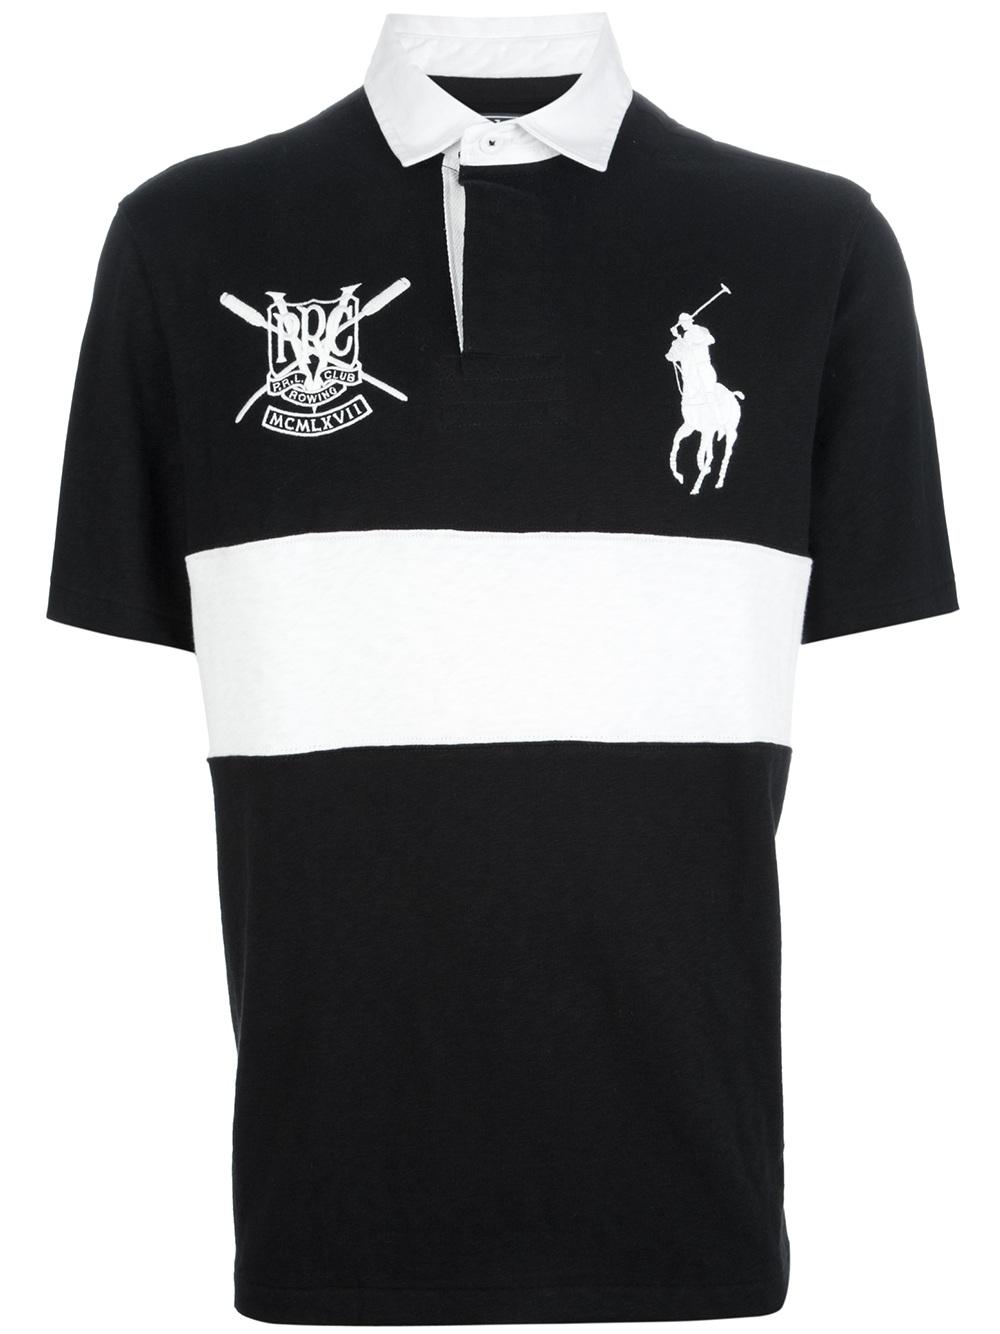 outlet store sale coupon codes crazy price Ralph Lauren Polo Shirt Black White   RLDM